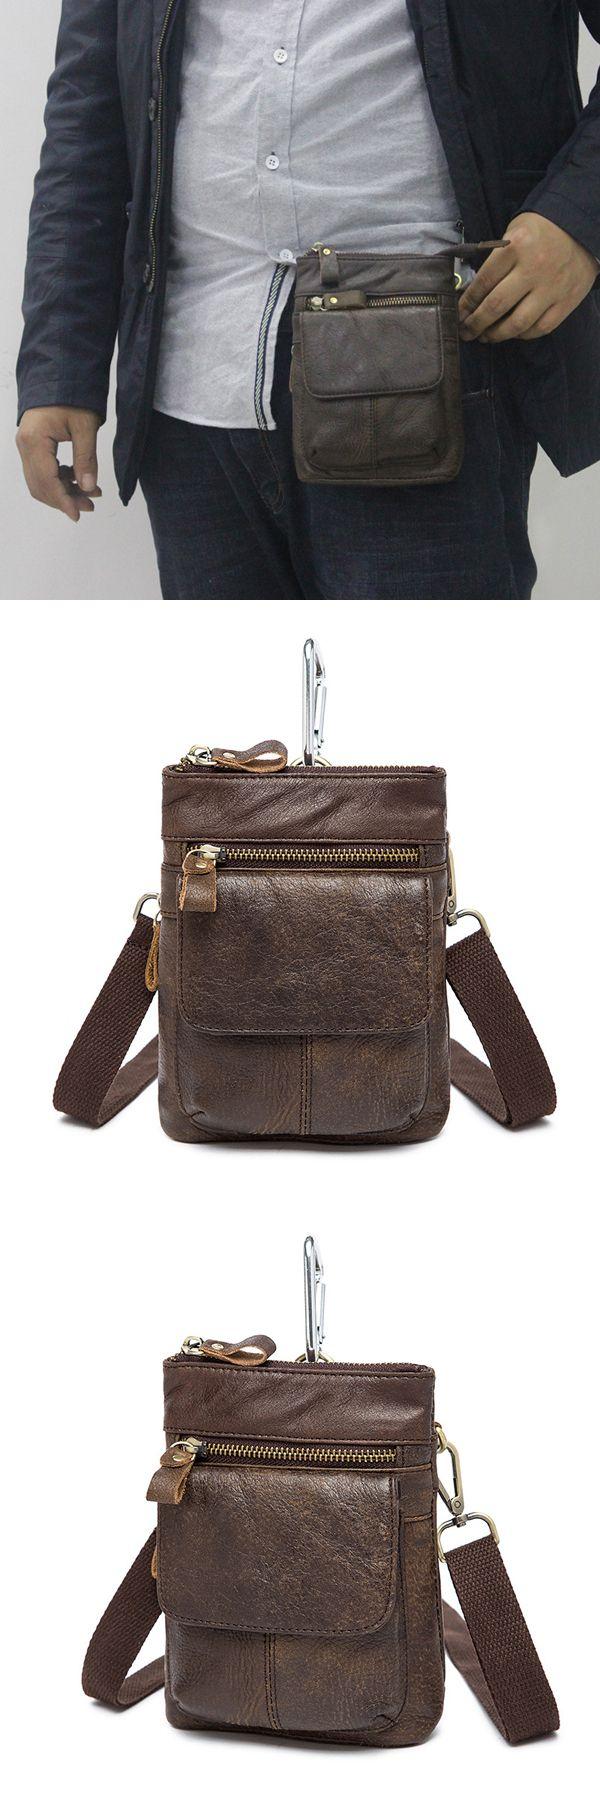 Male Genuine Leather Waist Bag Powerbank Phone Waist Pouch Vintage Small Crossbody Bag